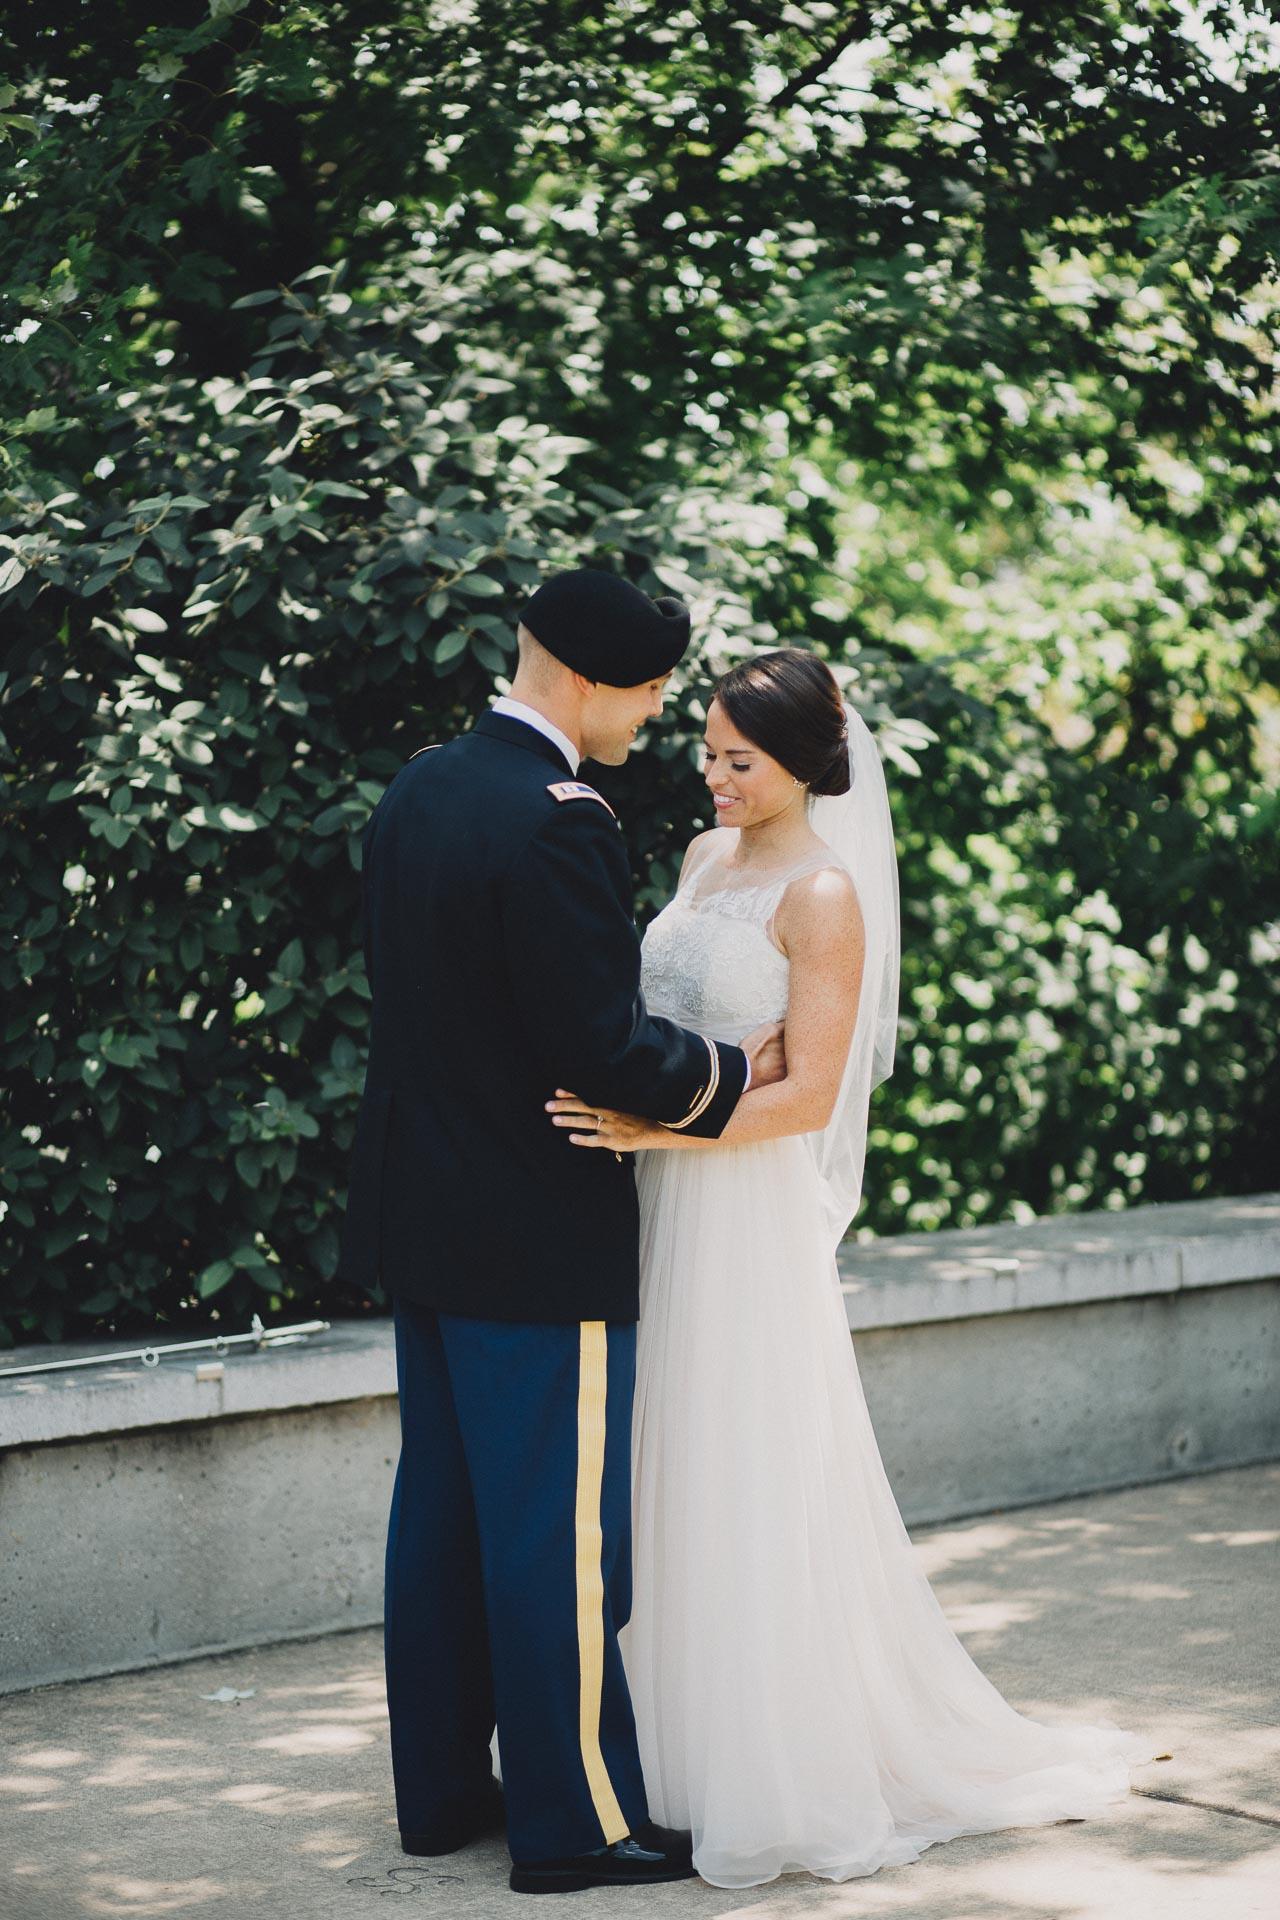 Emily-Eddie-Cincinnati-Rennaissance-Hotel-Wedding-032@2x.jpg